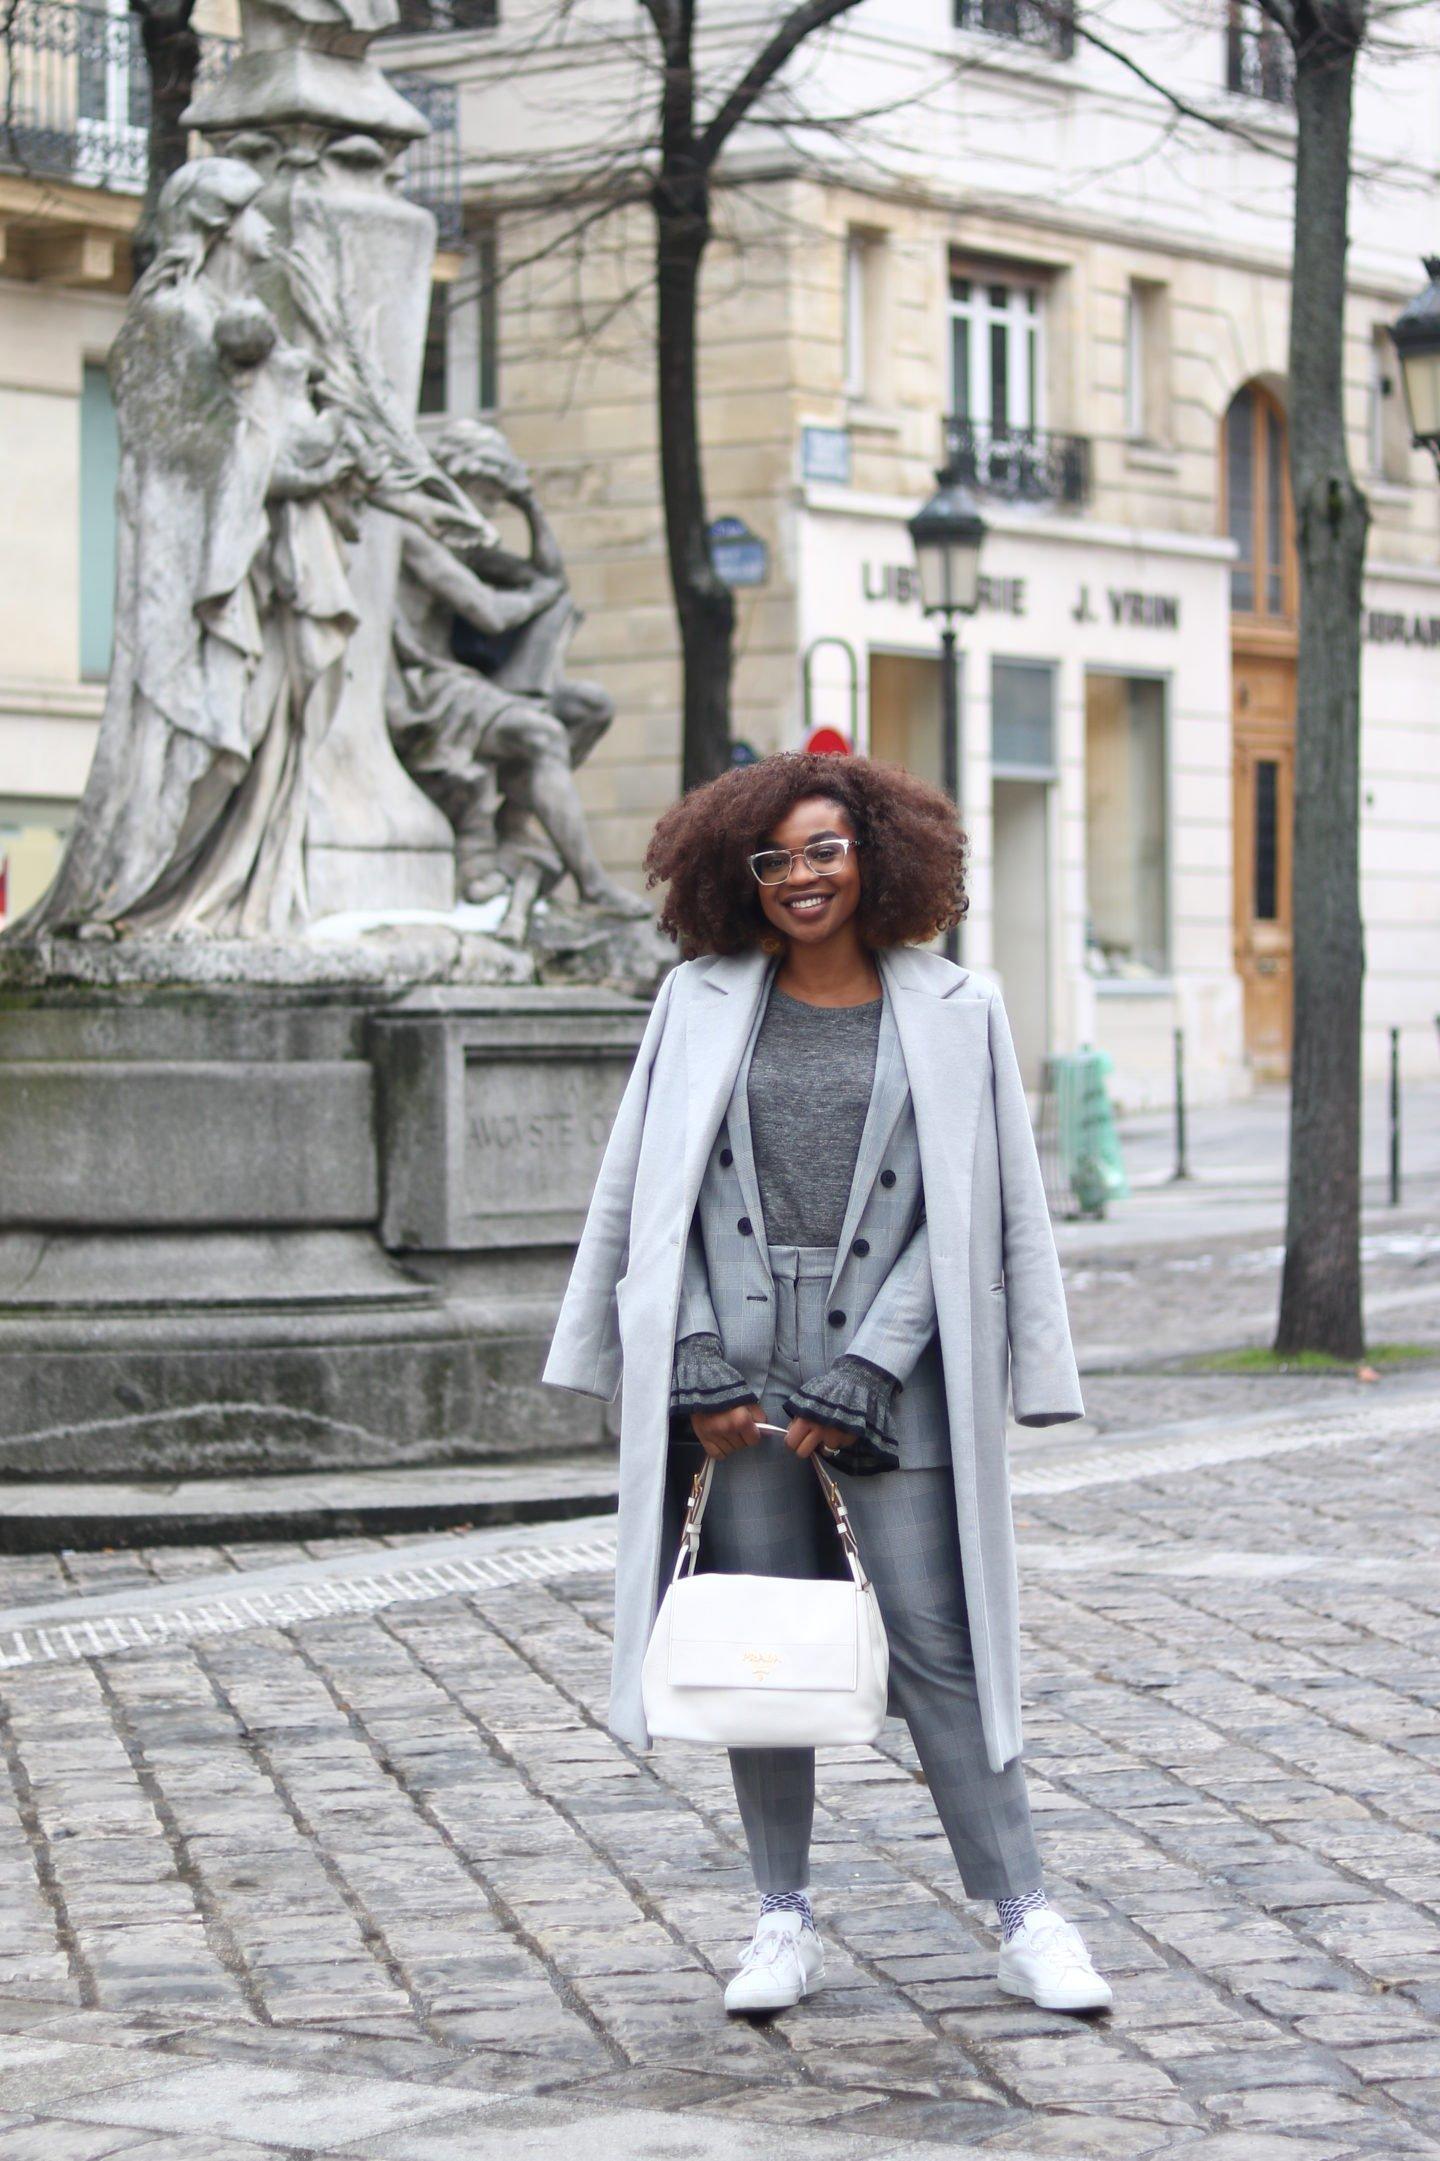 Fashion blogger Ijeoma Kola wears monochrome gray check suit with white sneakers for Paris Fashion Week